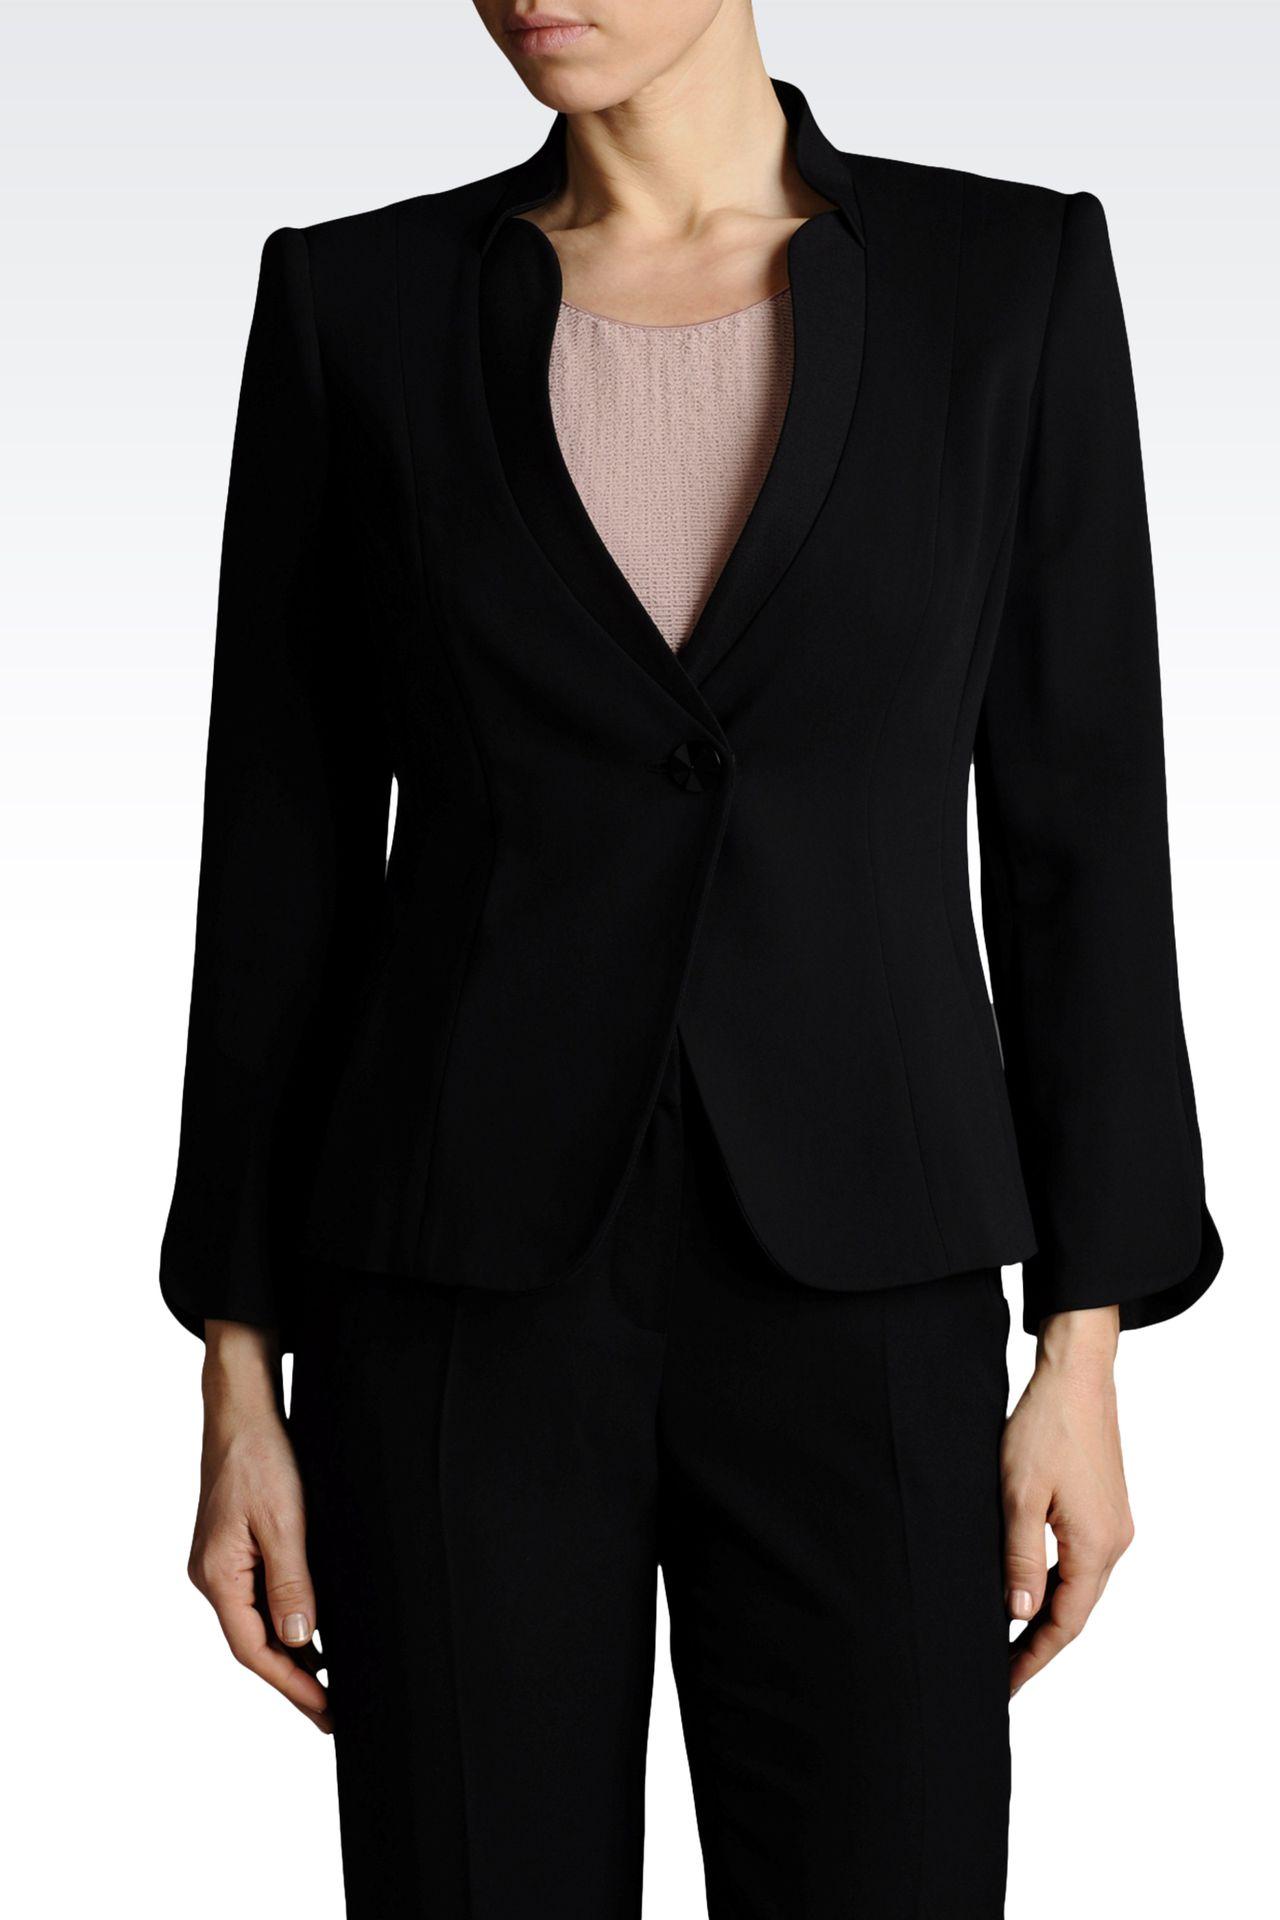 Armani Collezioni Women One Button Jacket - SINGLE BUTTON JACKET IN CRÊPE Armani Collezioni Official Online Store